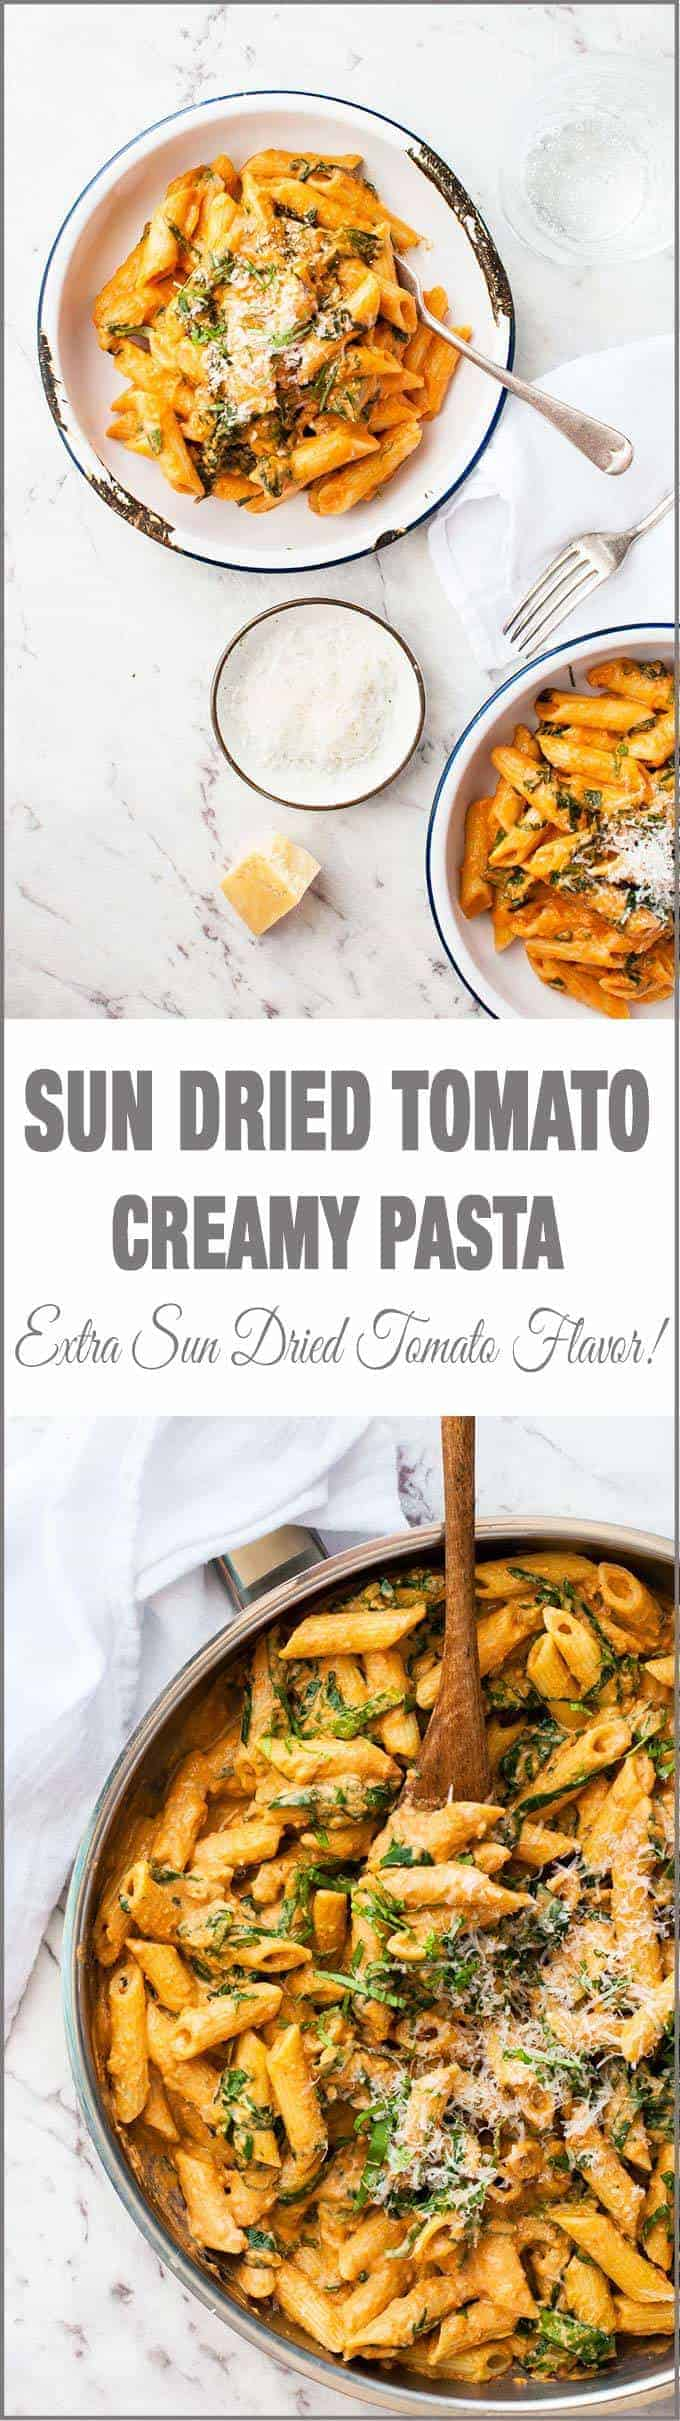 Creamy Sun Dried Tomato Pasta - it's like a creamy pesto, bursting with sun dried tomato and basil flavours!